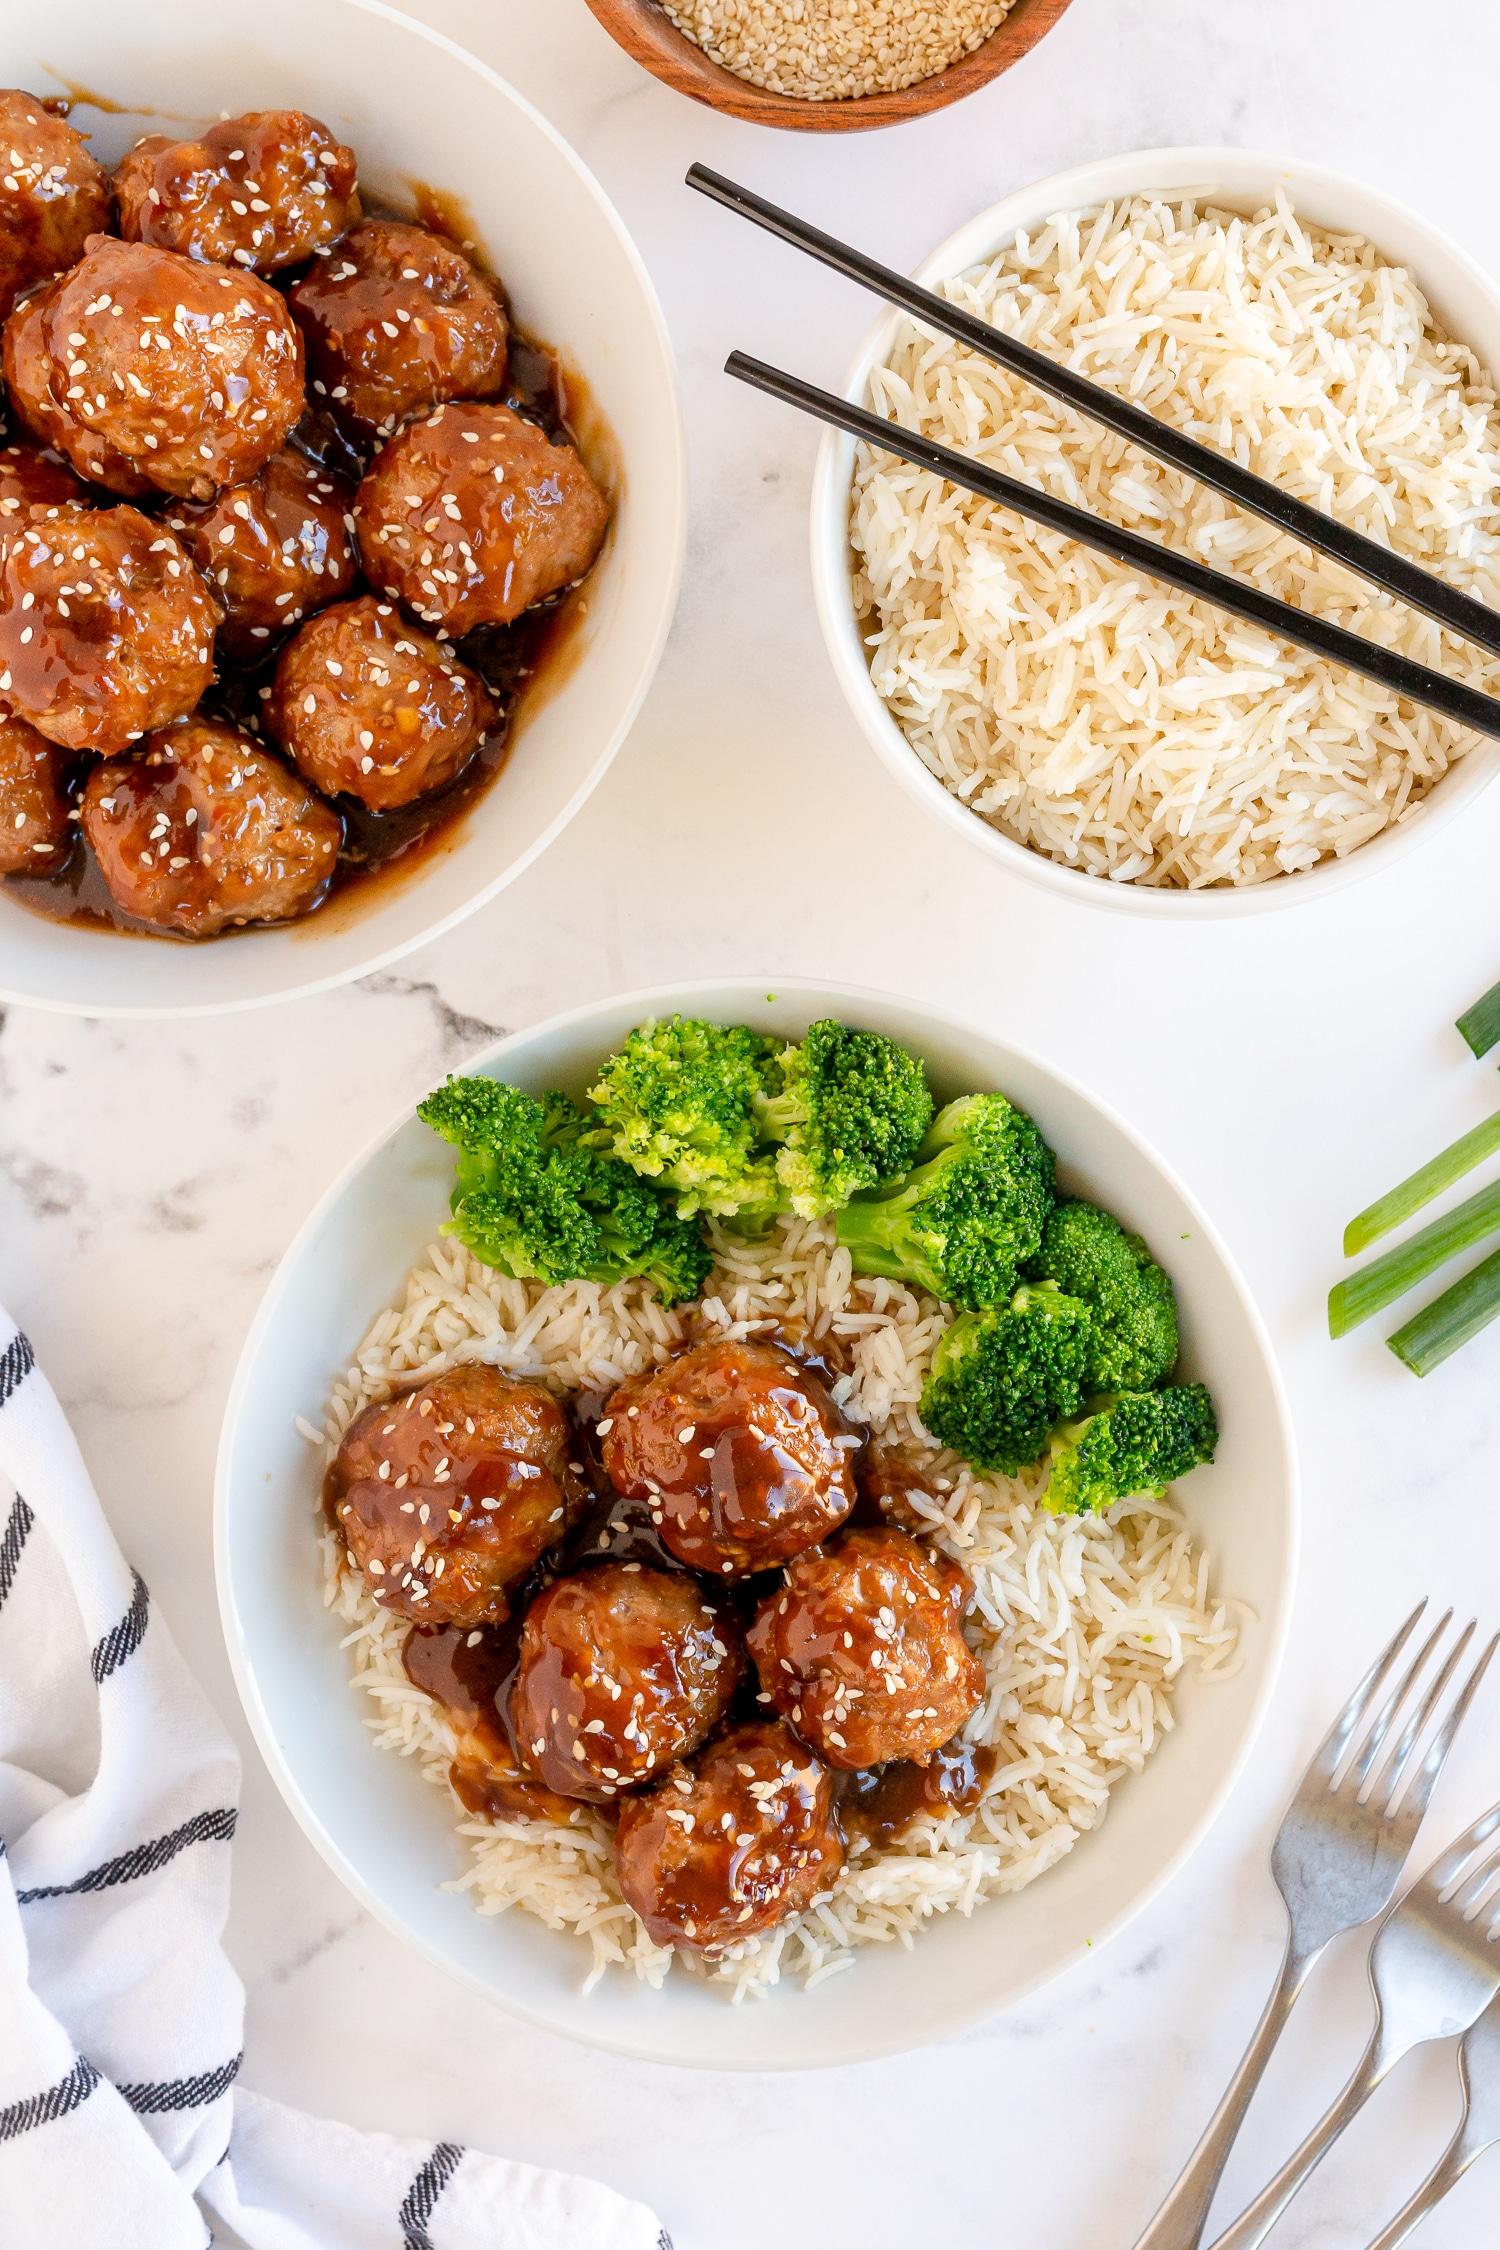 teriyaki turkey meatballs served on rice with broccoli